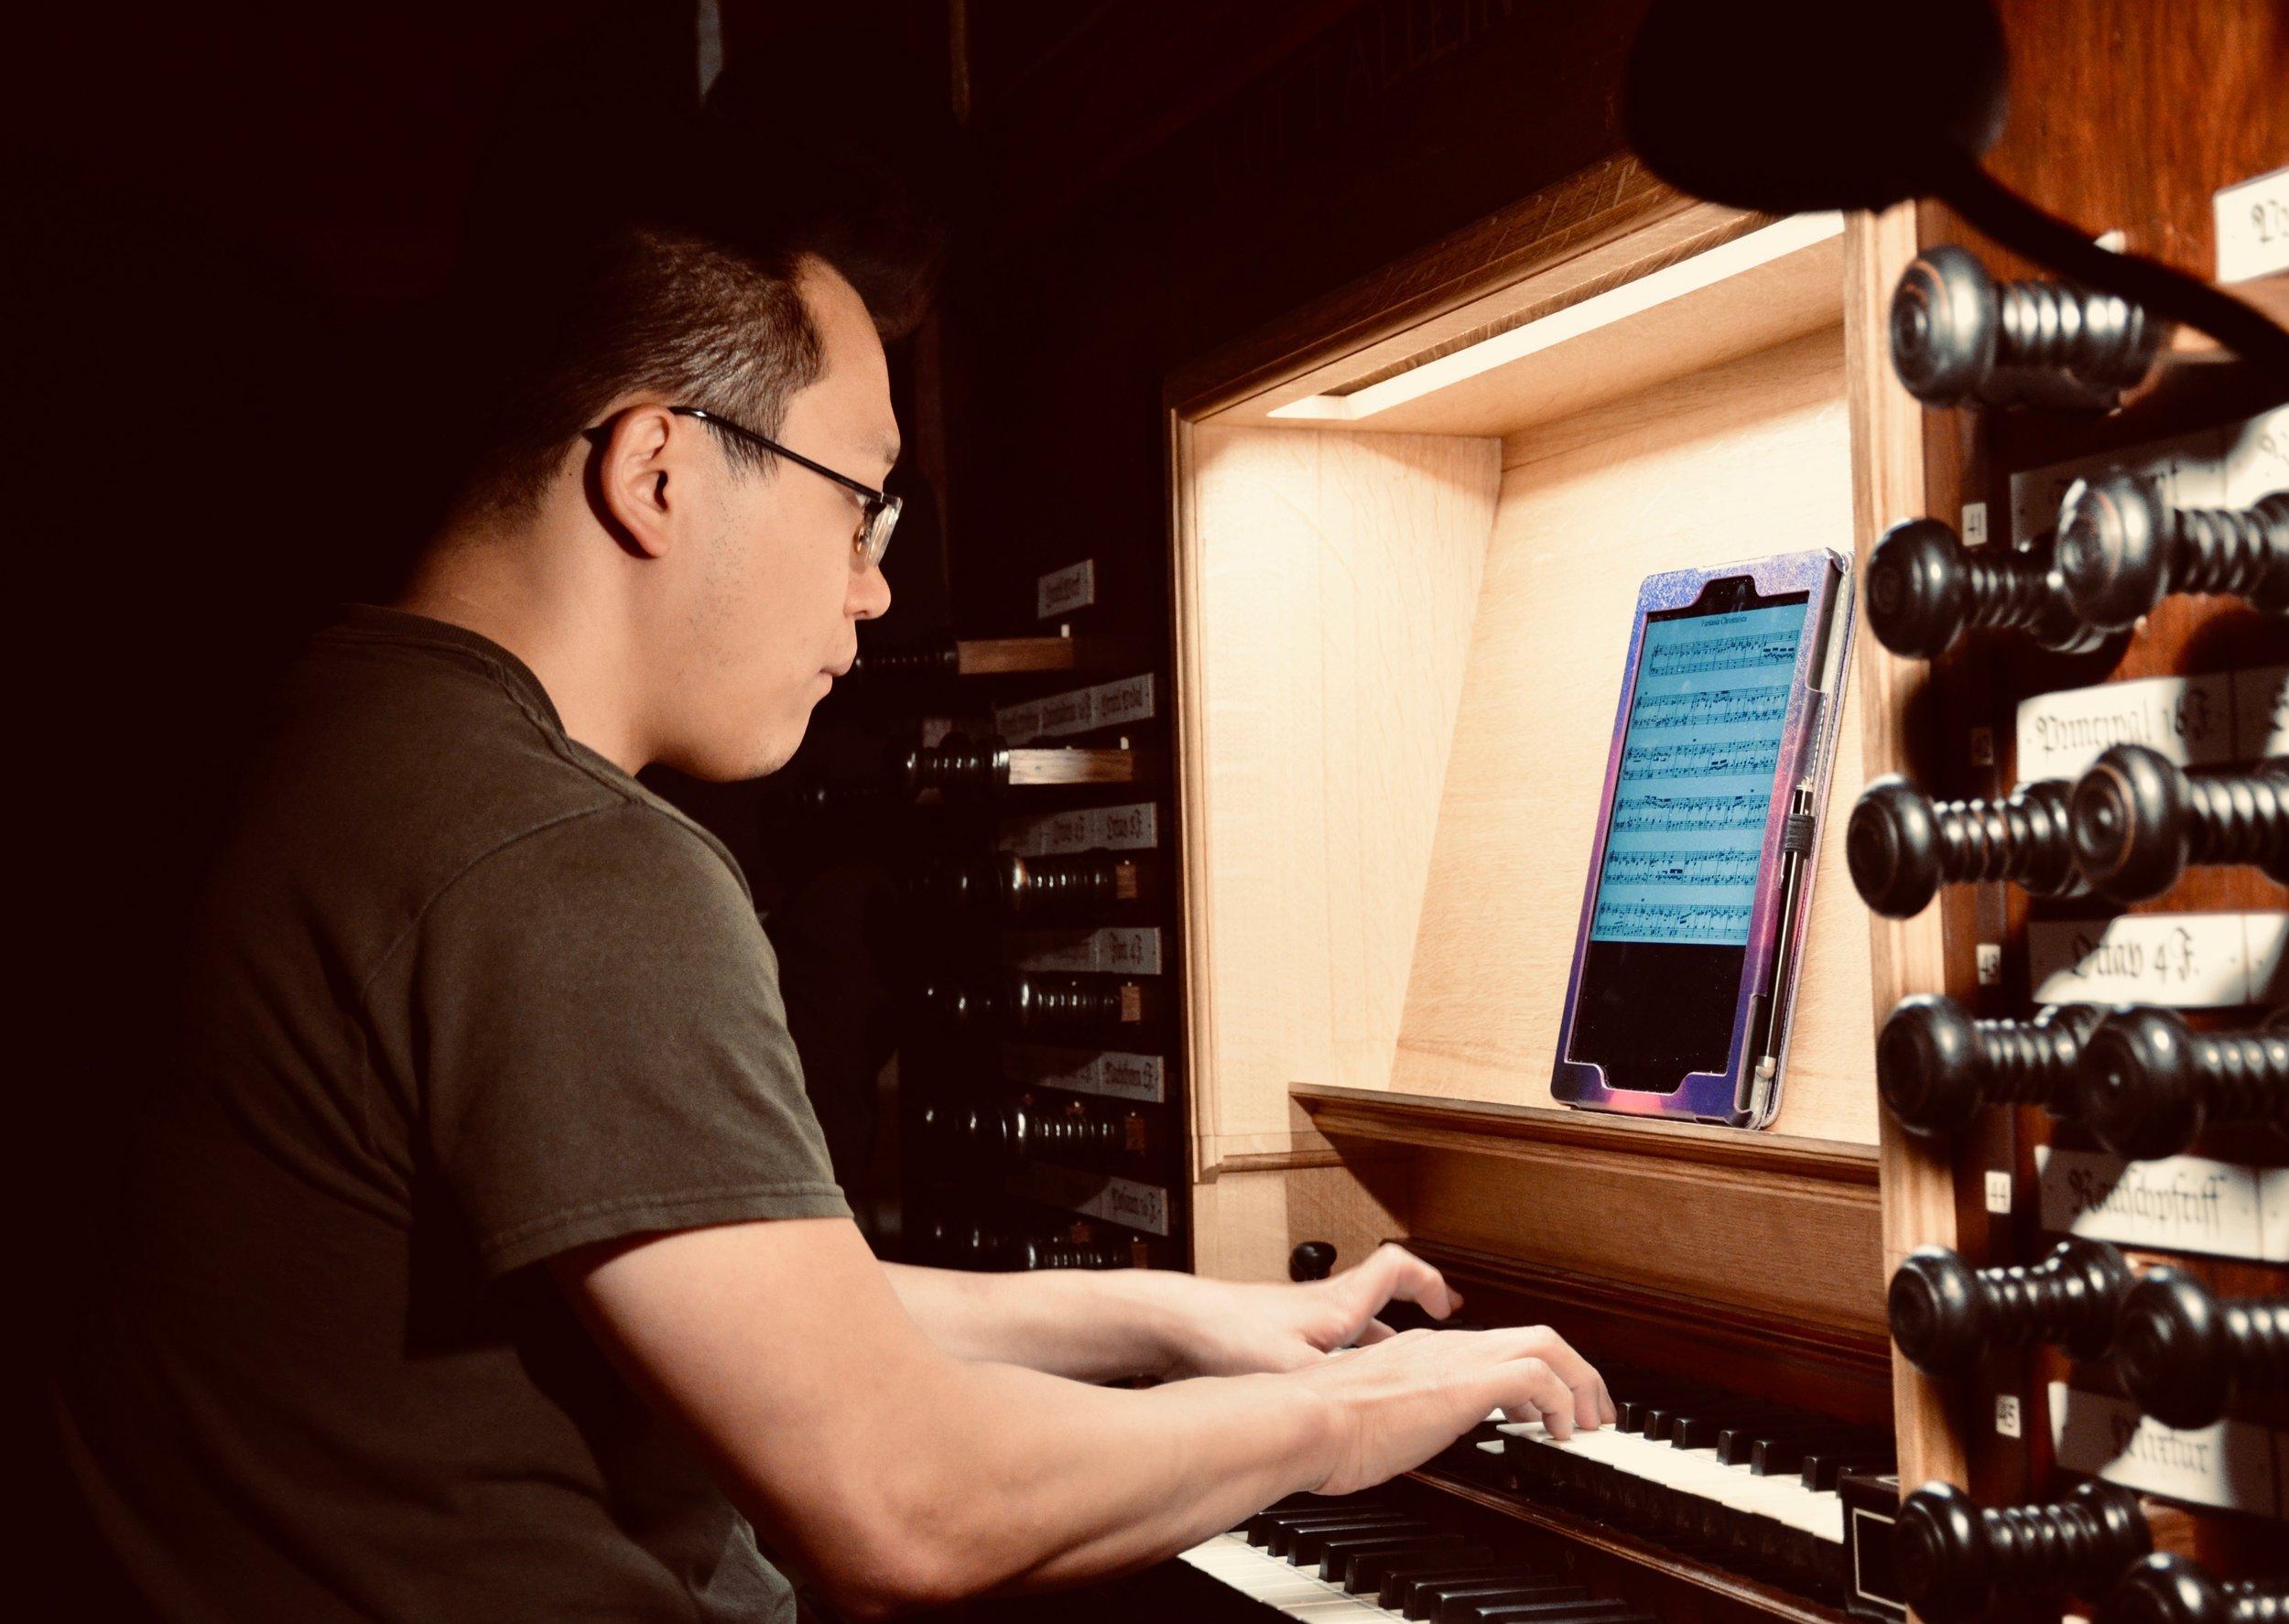 Adrian Cho plays the 1688 Schnitger Organ, St. Pankratius, Neuenfelde, Germany. Boston Organ Studio.